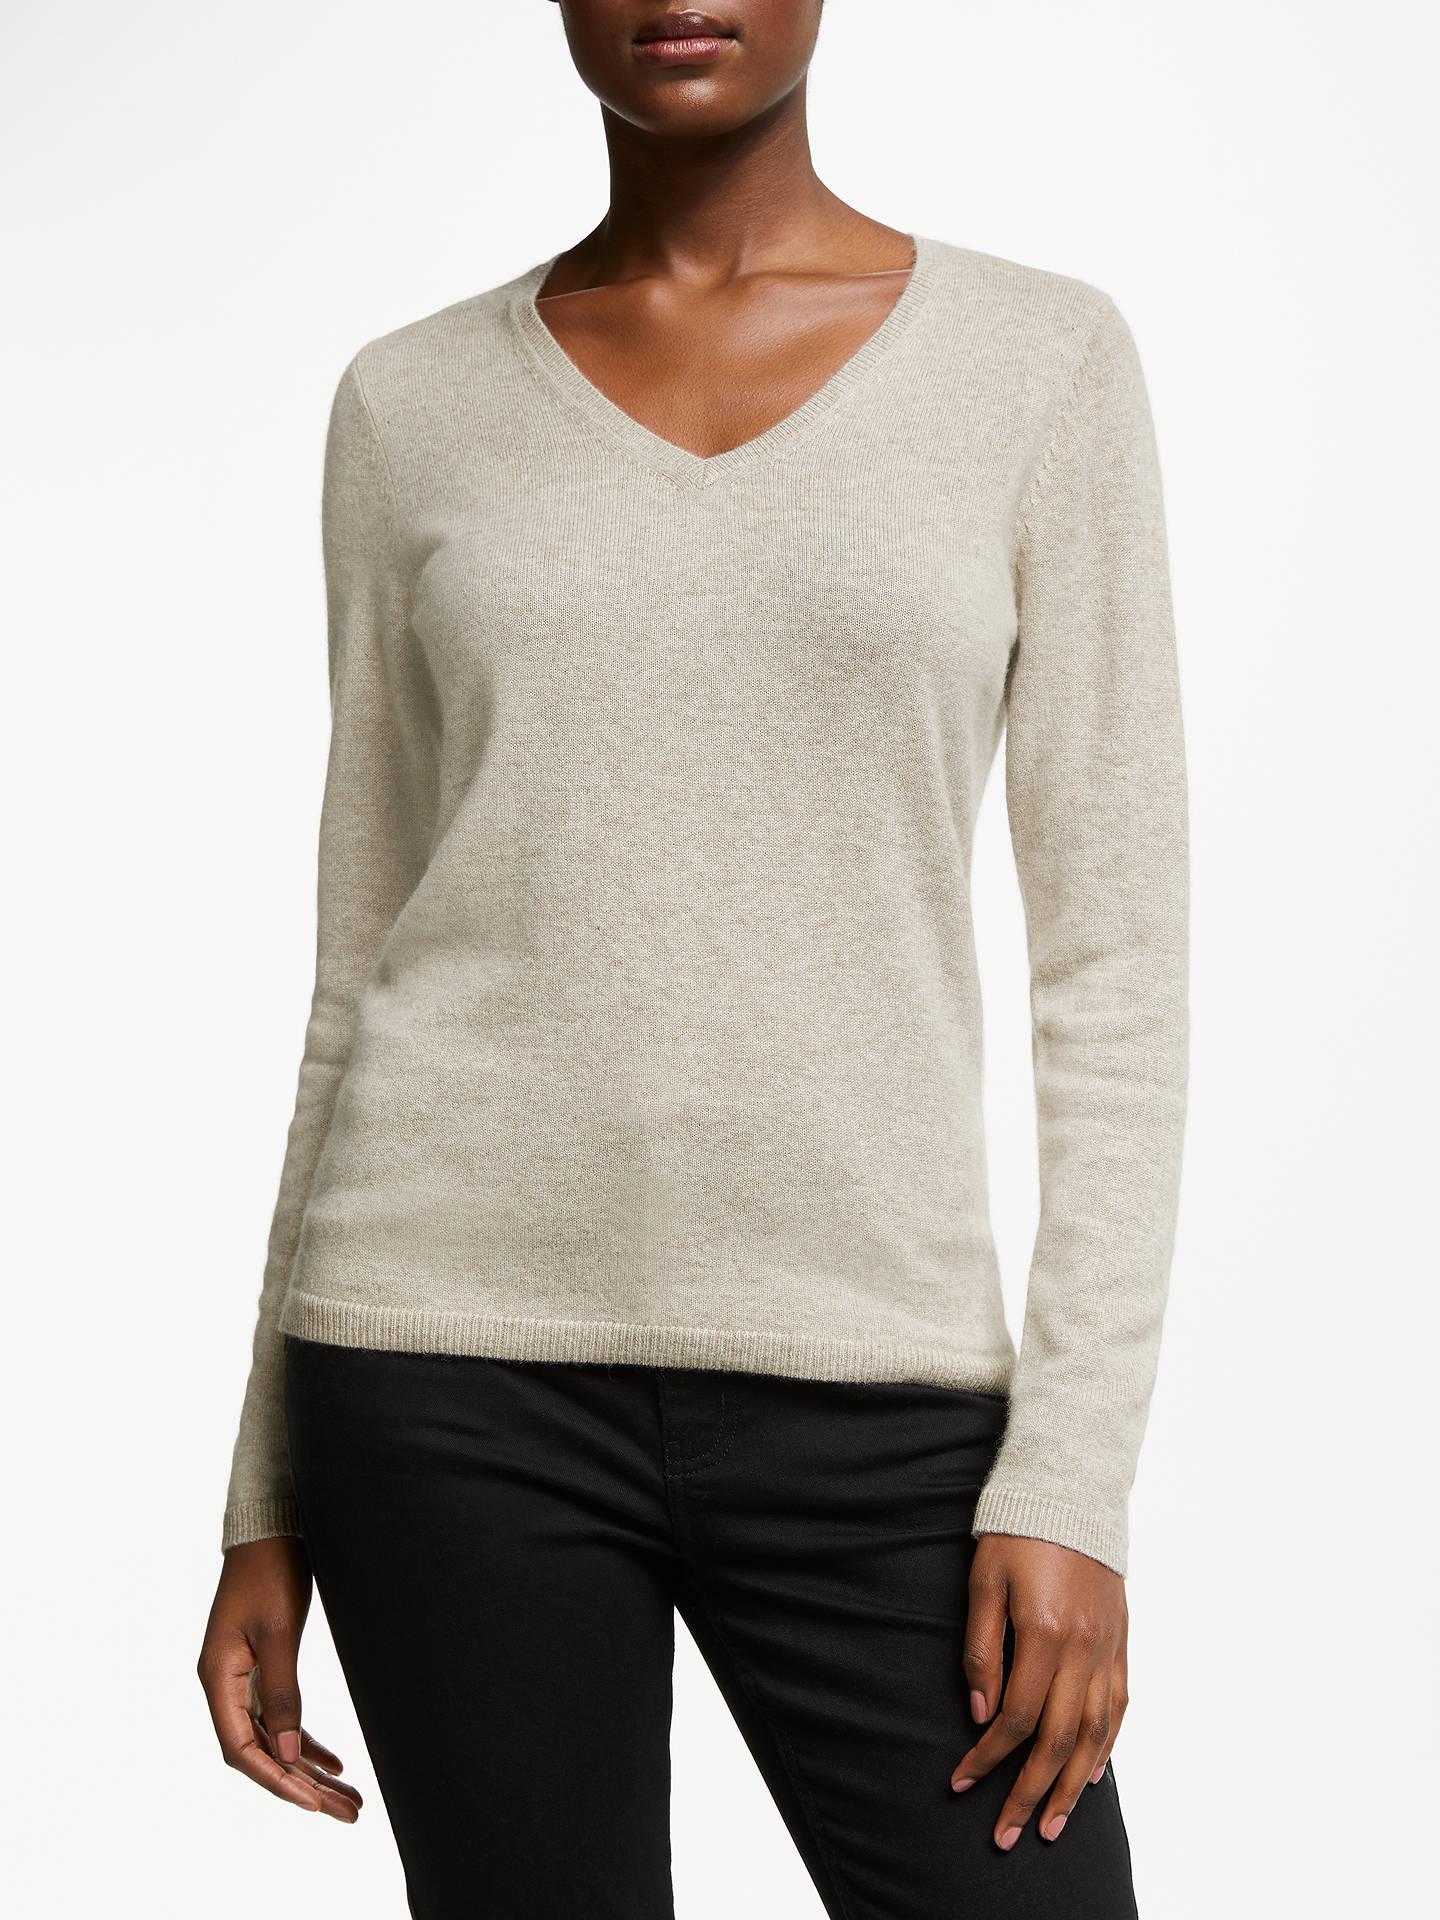 John Lewis & Partners Cashmere Rib Trim V Neck Sweater at